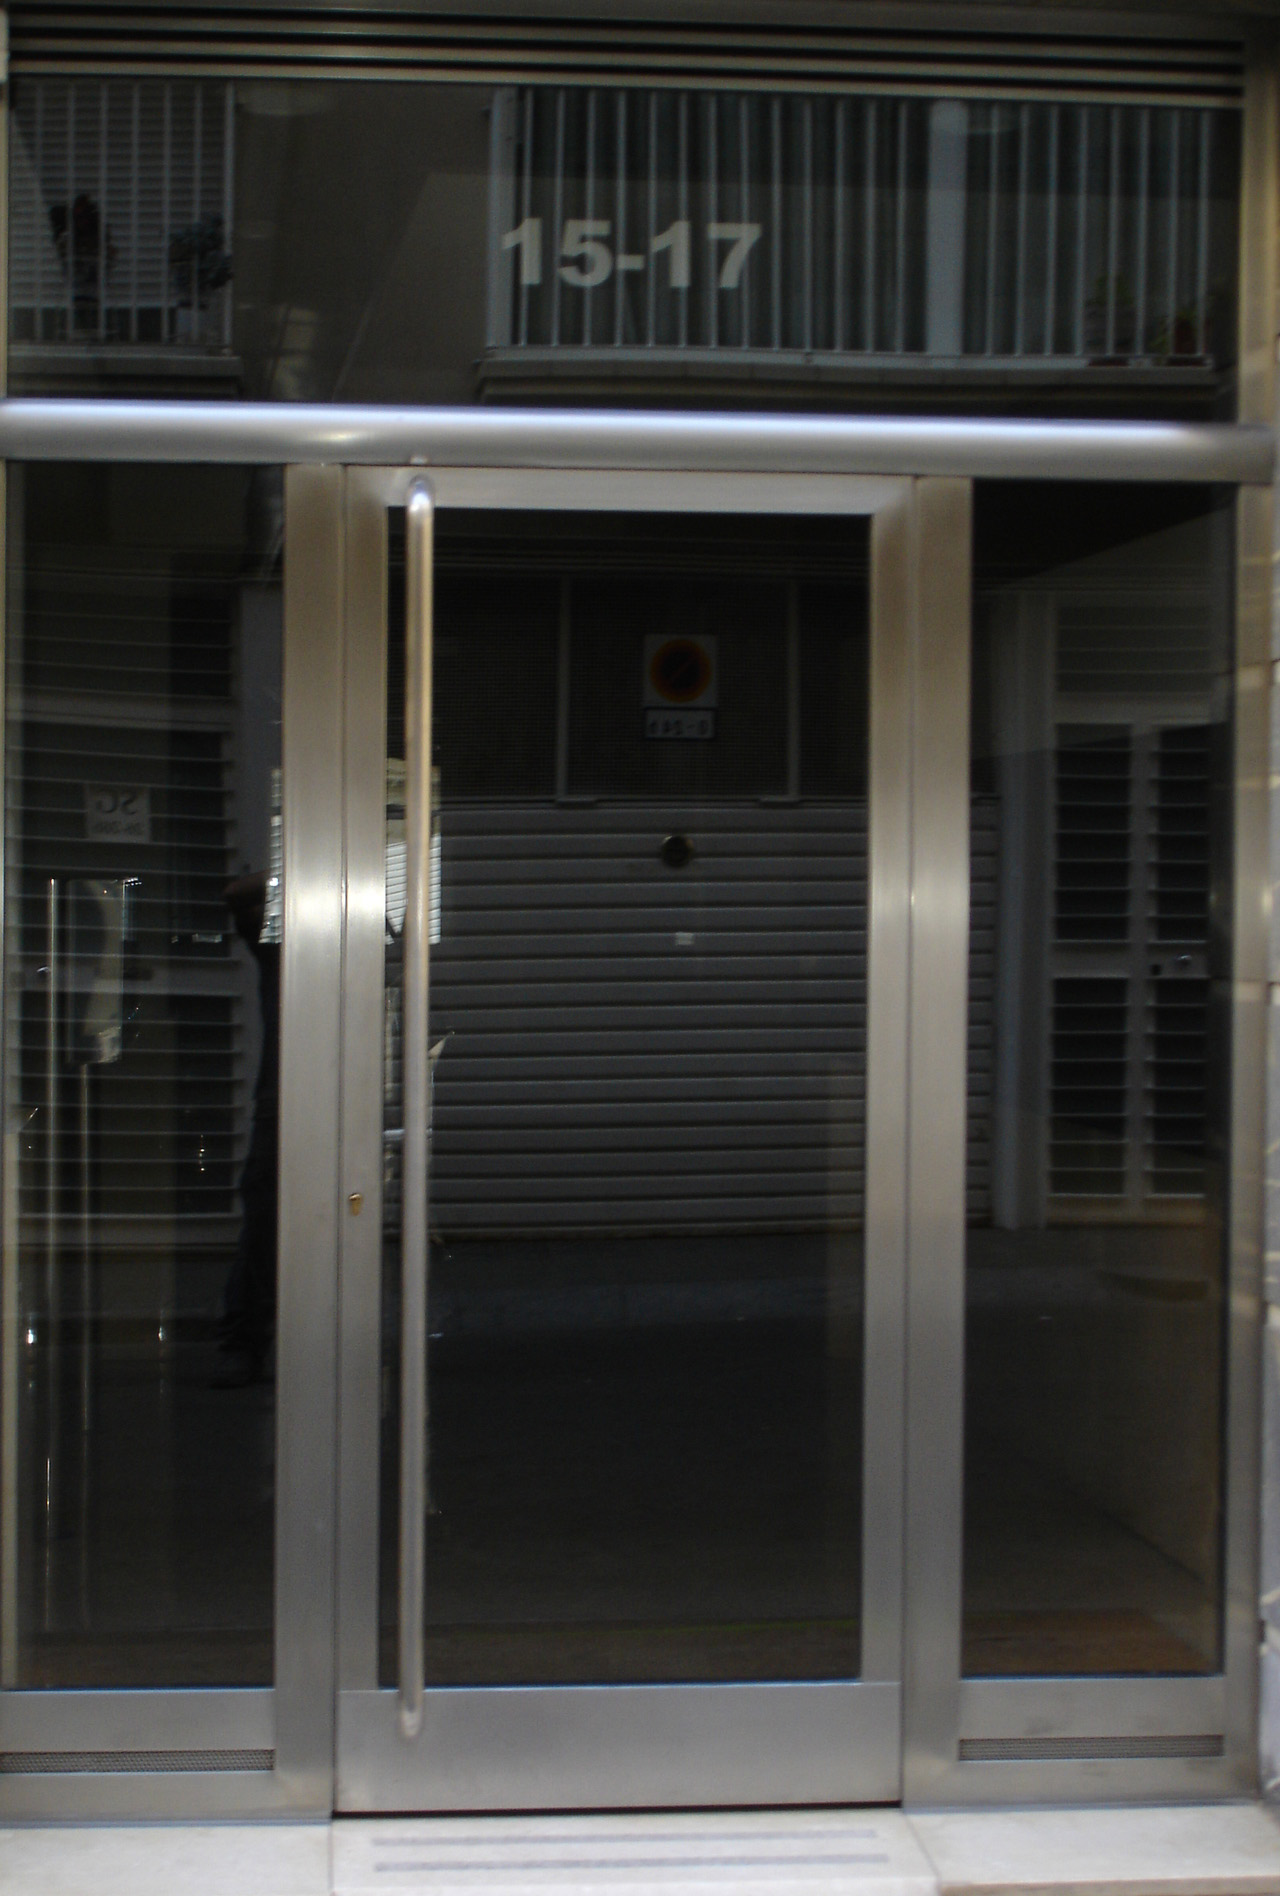 Puertas de acero inoxidable grupo inoxmetal for Puertas de acero inoxidable